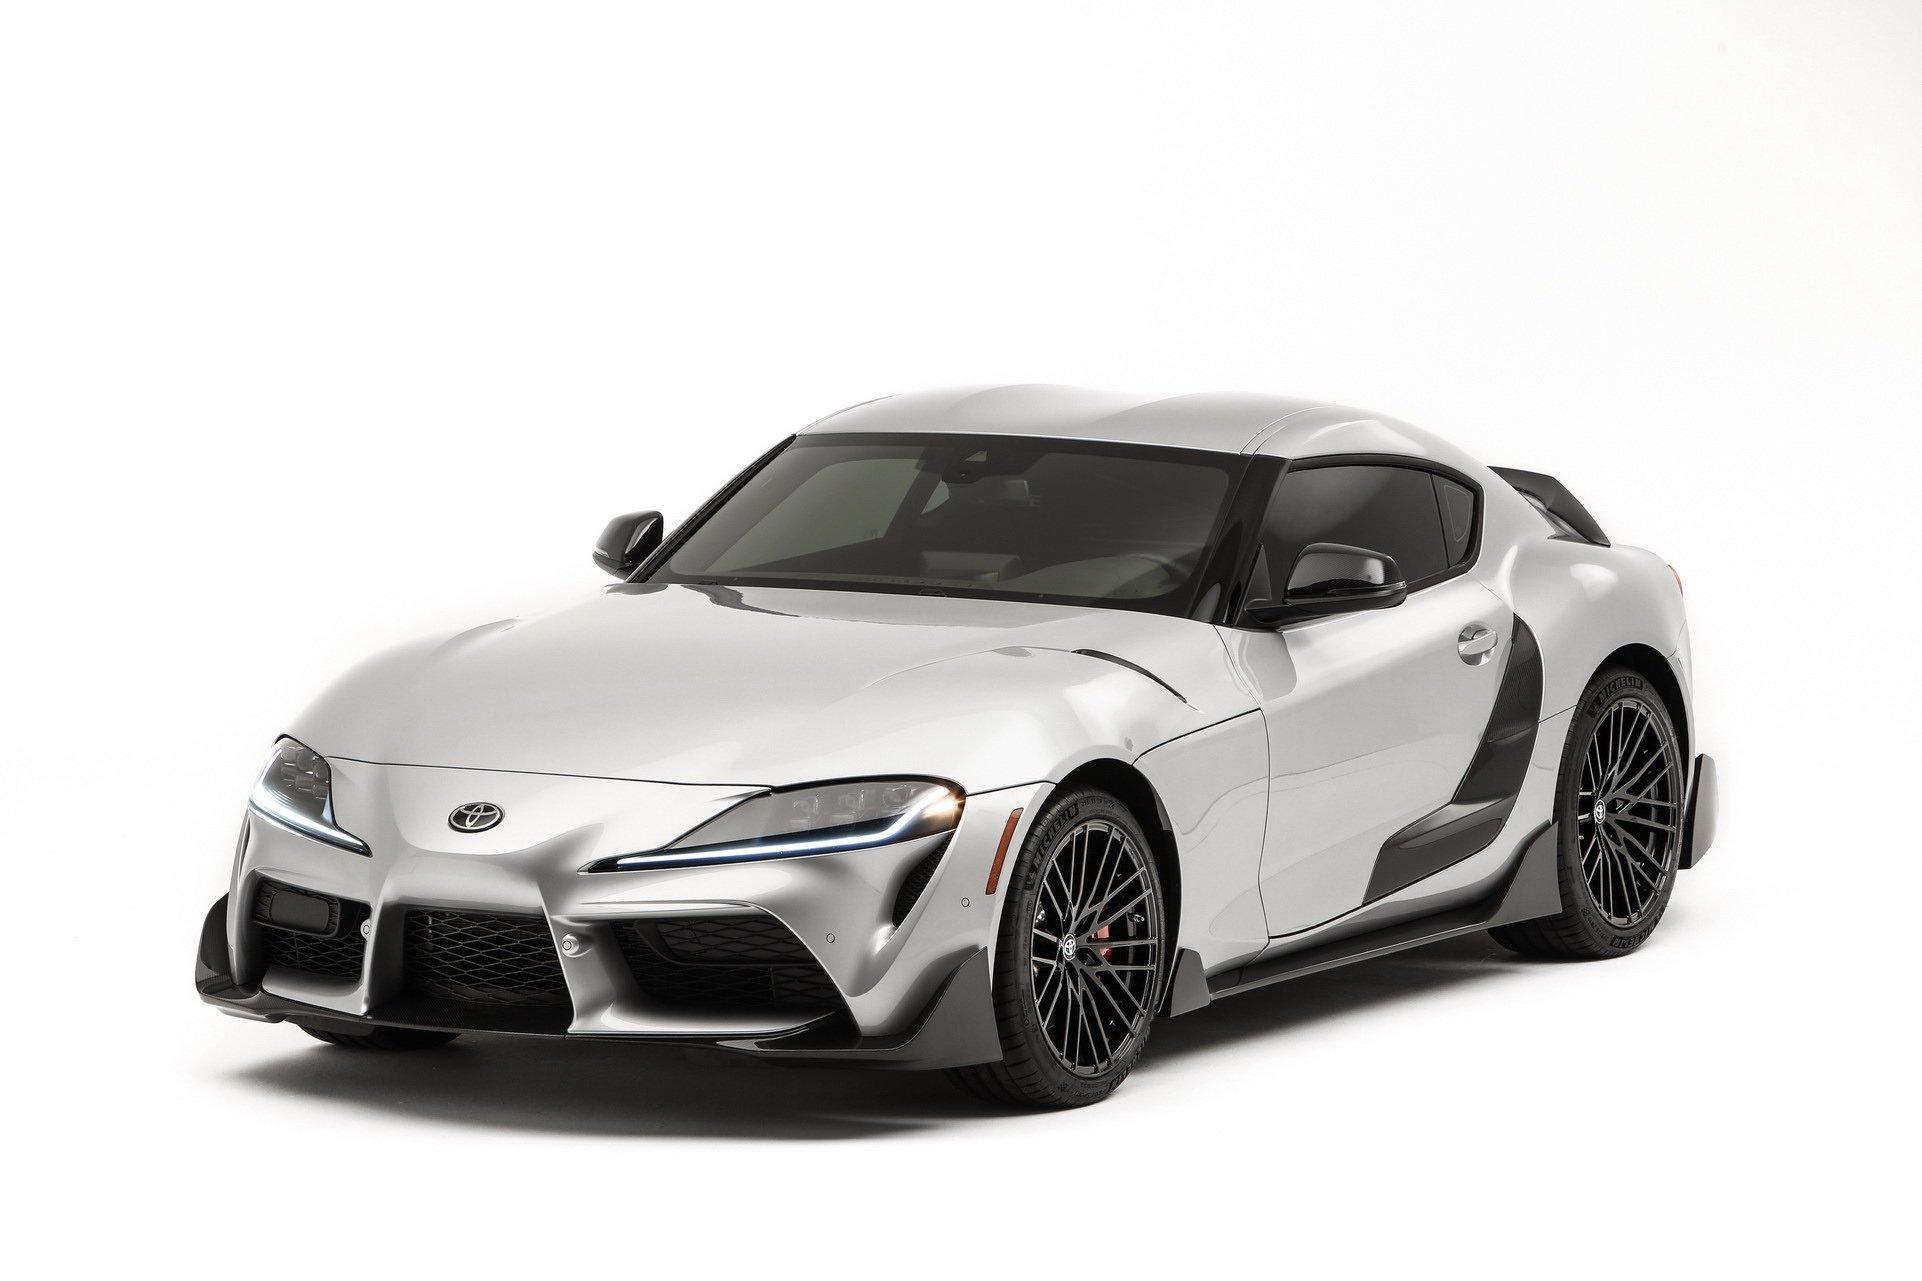 2020-Toyota-GR-Supra-Performance-Line-Concept4